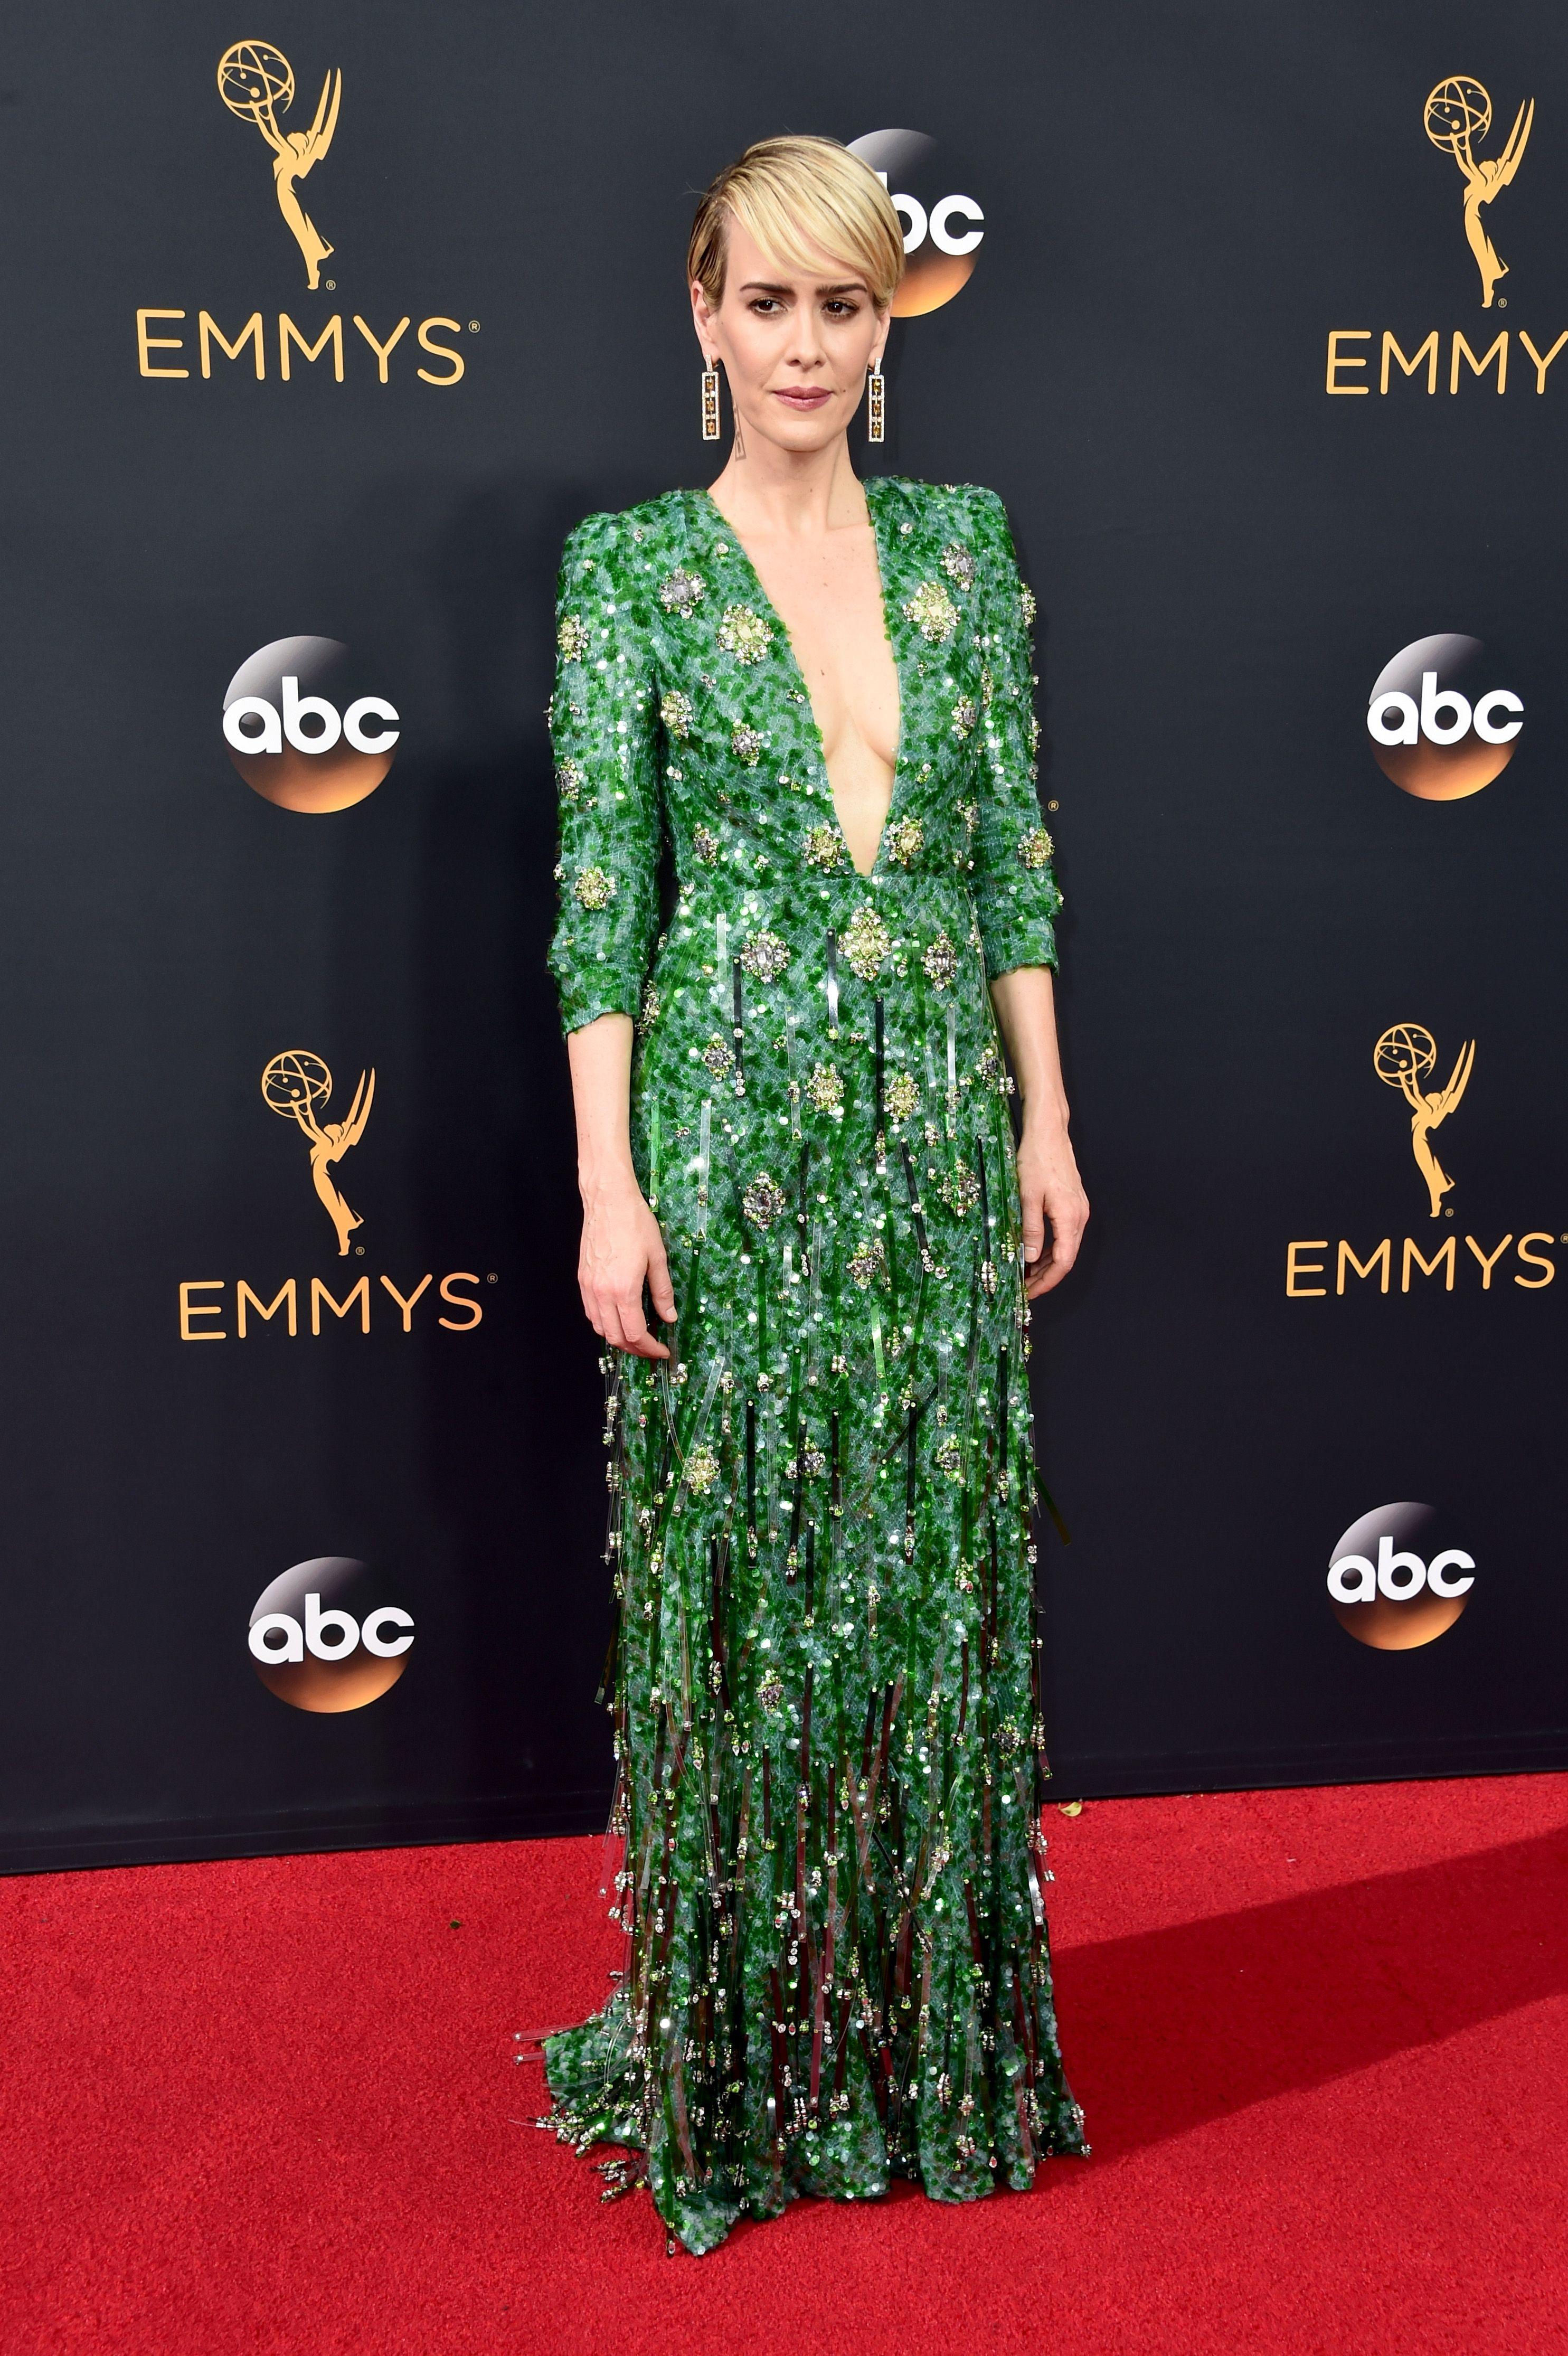 32 Best Emmys Dresses of All Time - Emmy Award Celeb Red Carpet Looks